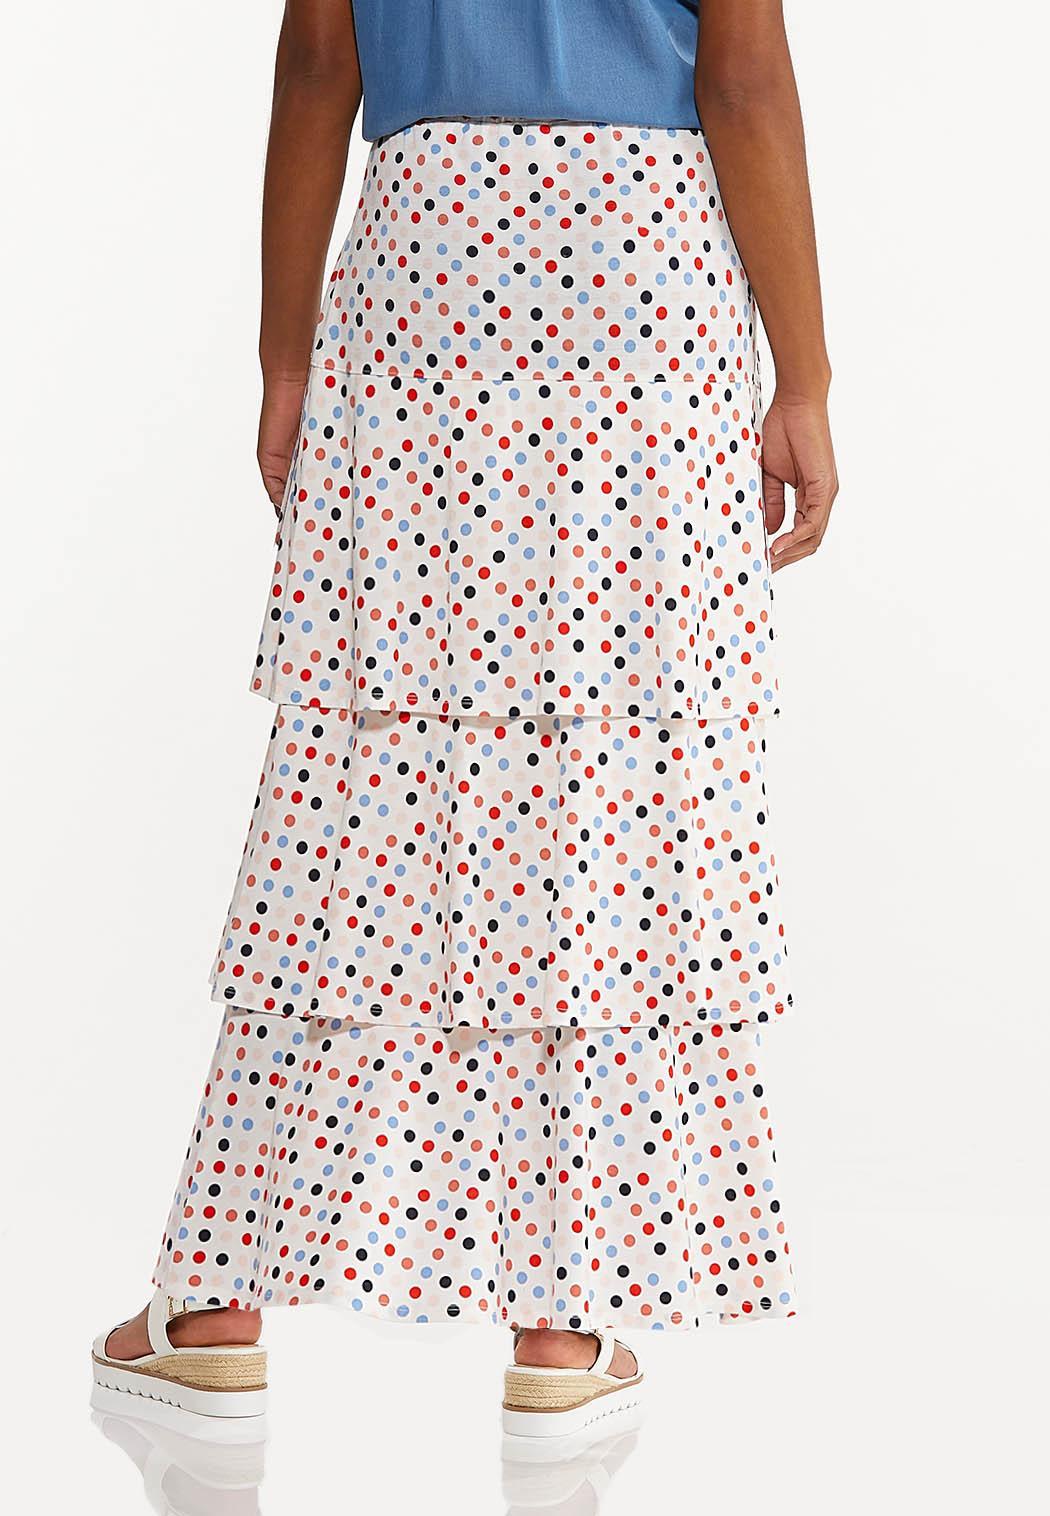 Plus Size Tiered Polka Dot Skirt (Item #44529586)